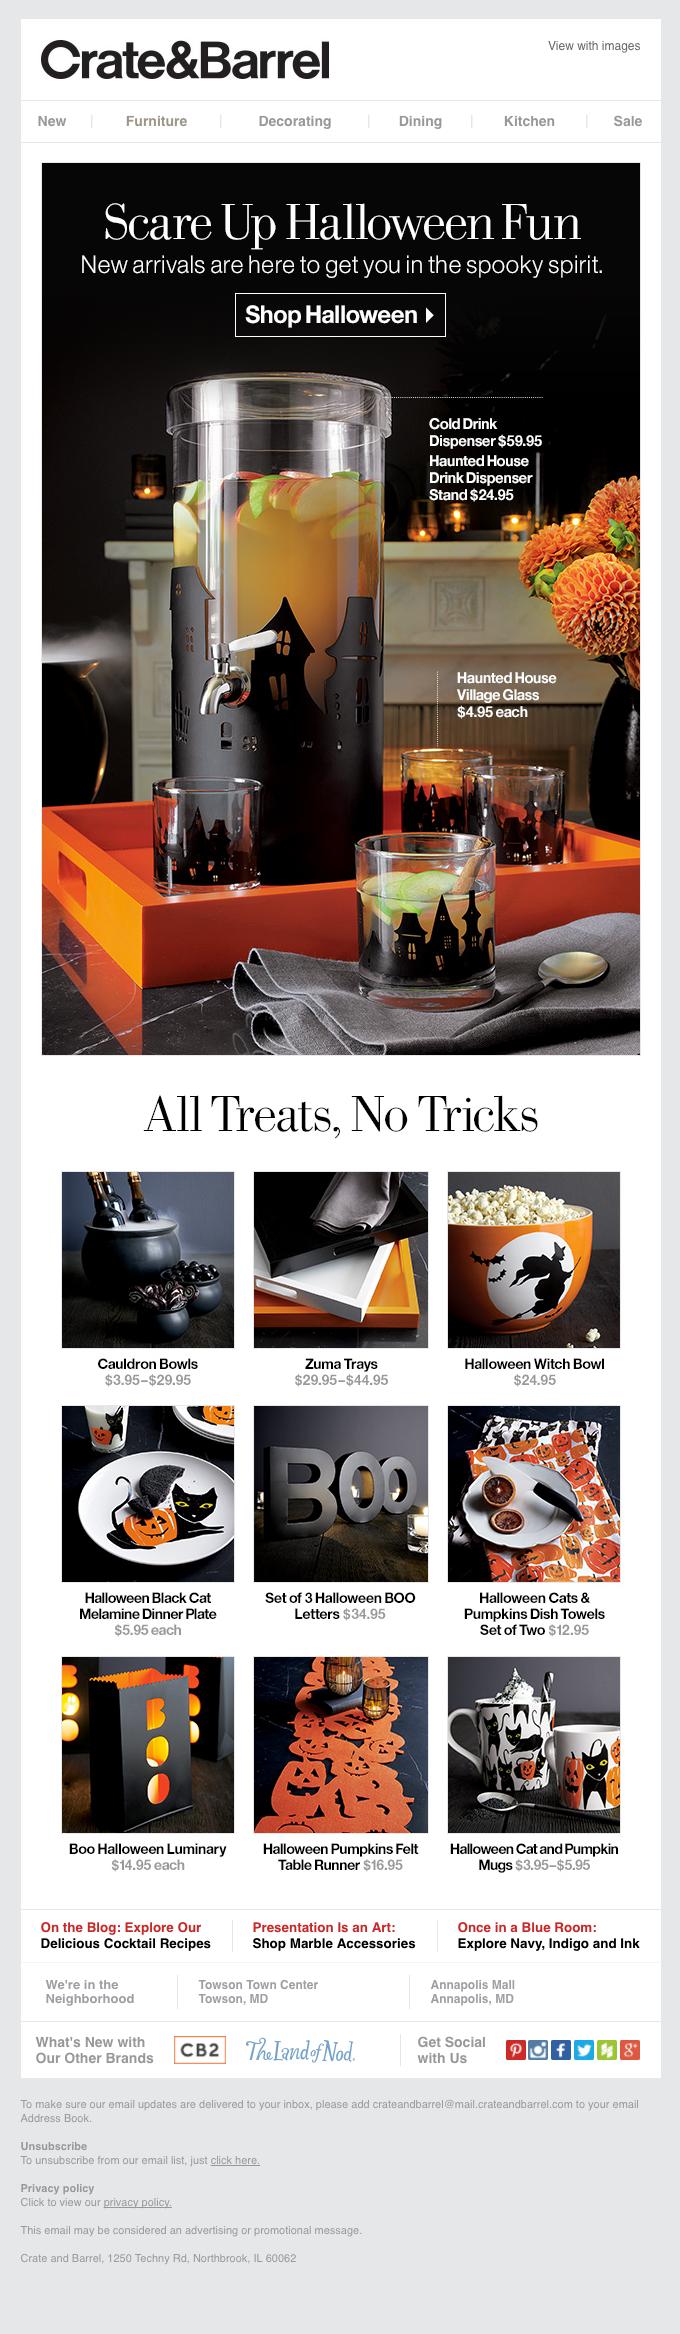 All treats, no tricks.